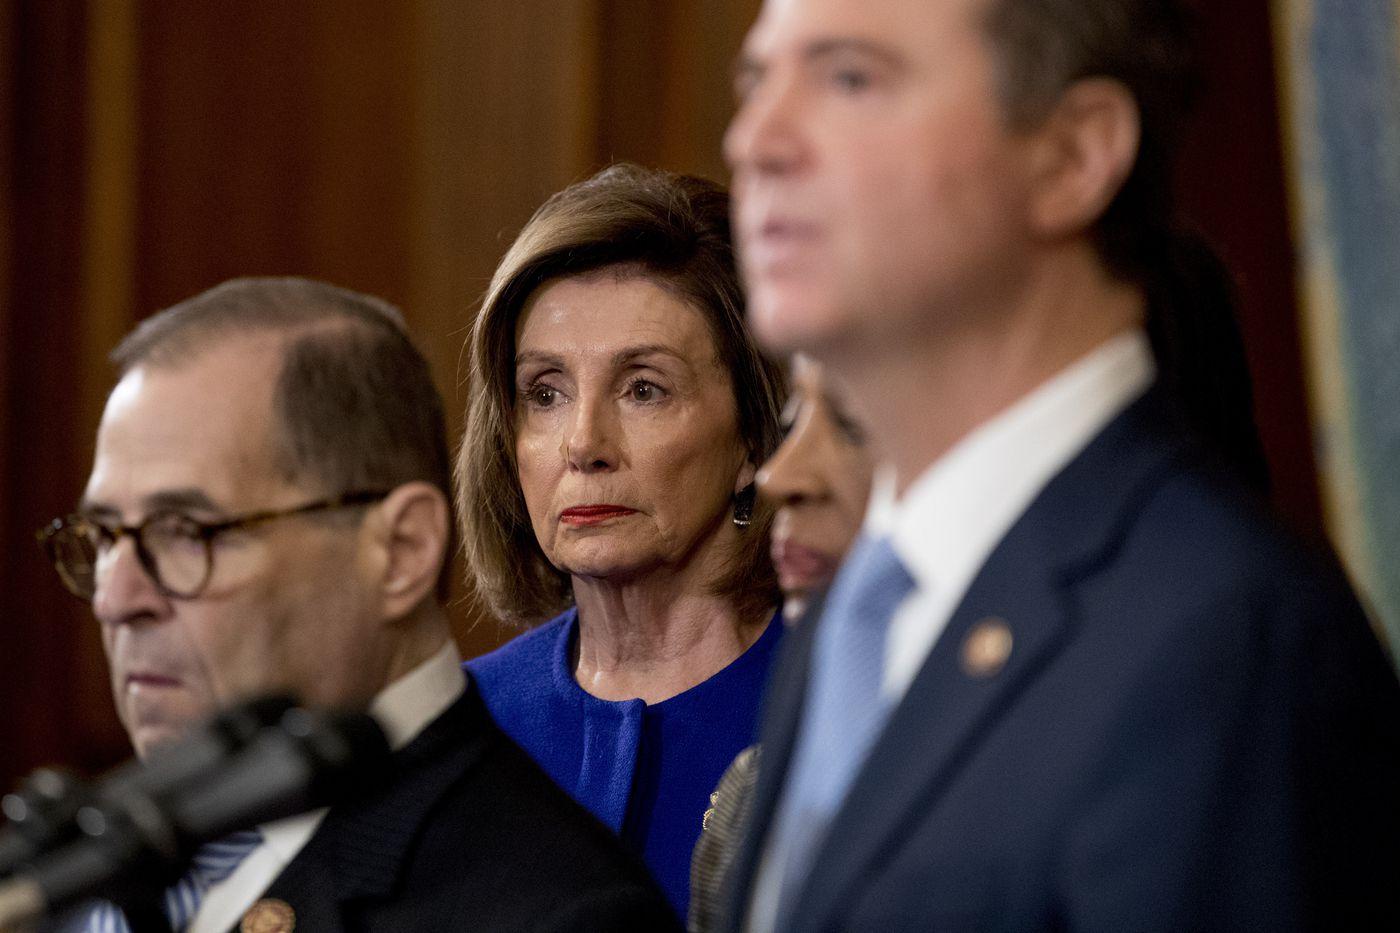 'We must act;' Democrats unveil Trump impeachment charges